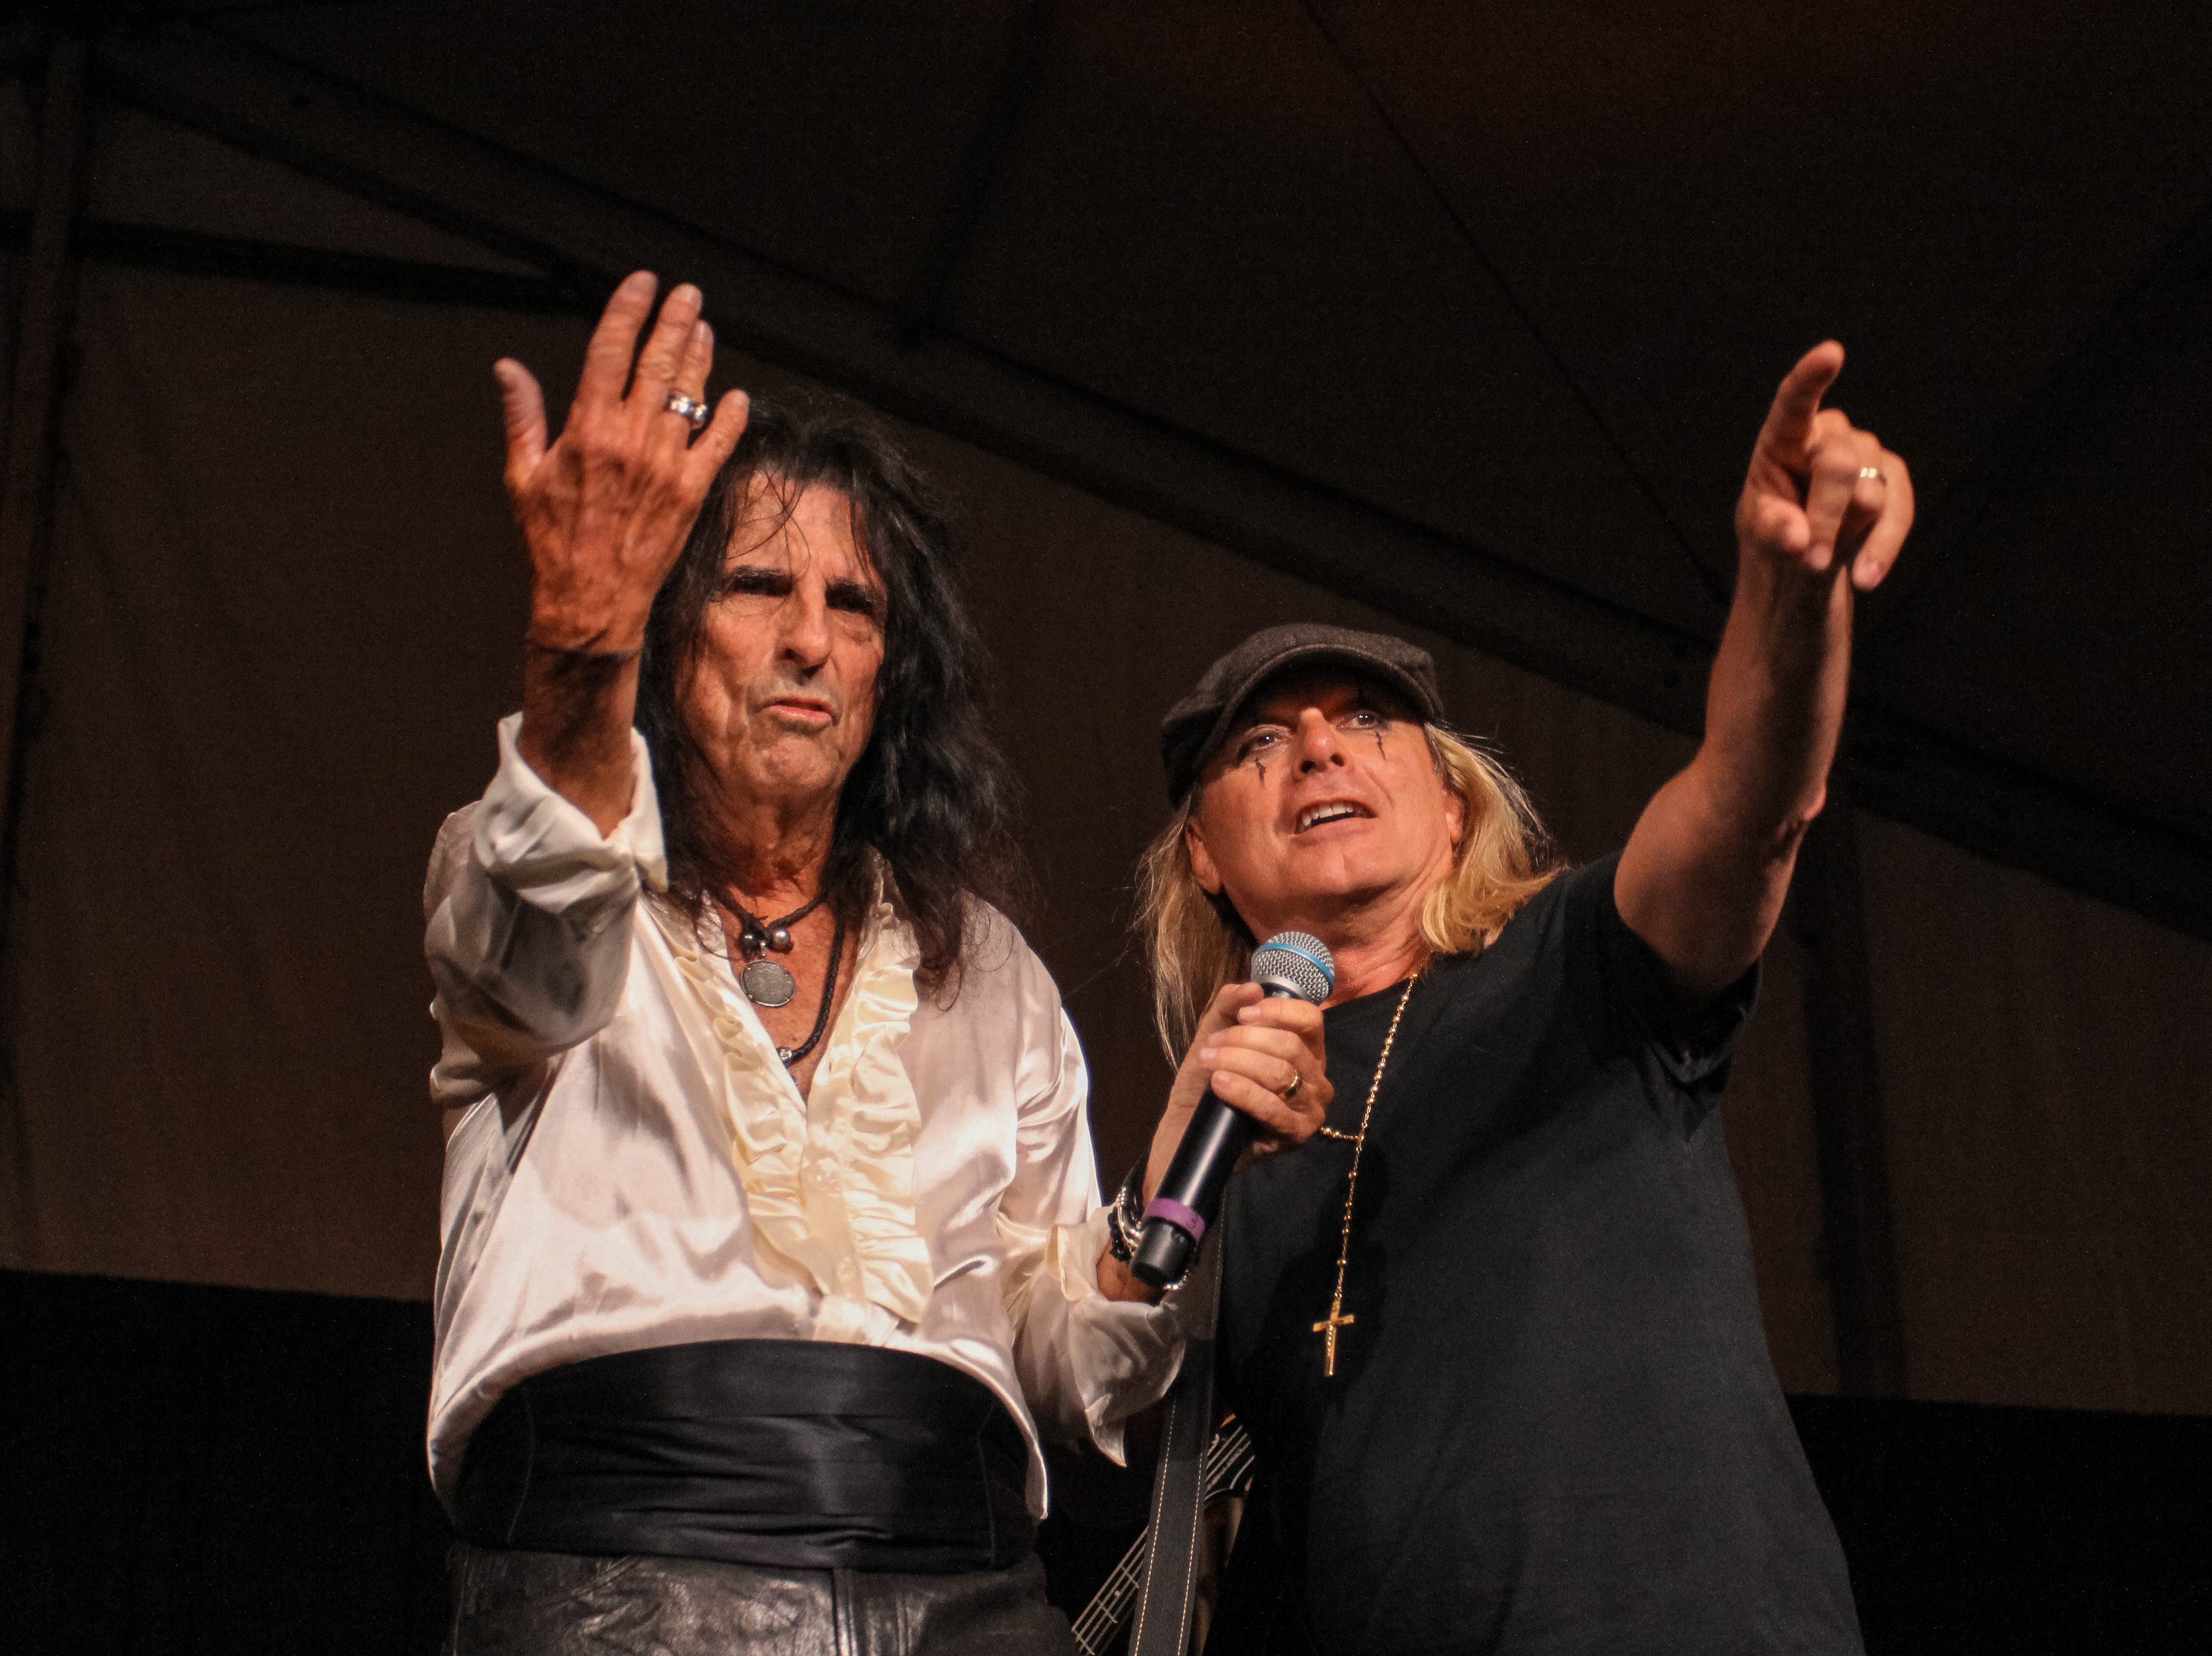 Alice Cooper and Robin Zander of Cheap Trick preform at Alice Cooper's Rock & Roll Fundraising Bash at the Las Sendas Golf Club in Mesa on April 27, 2019.